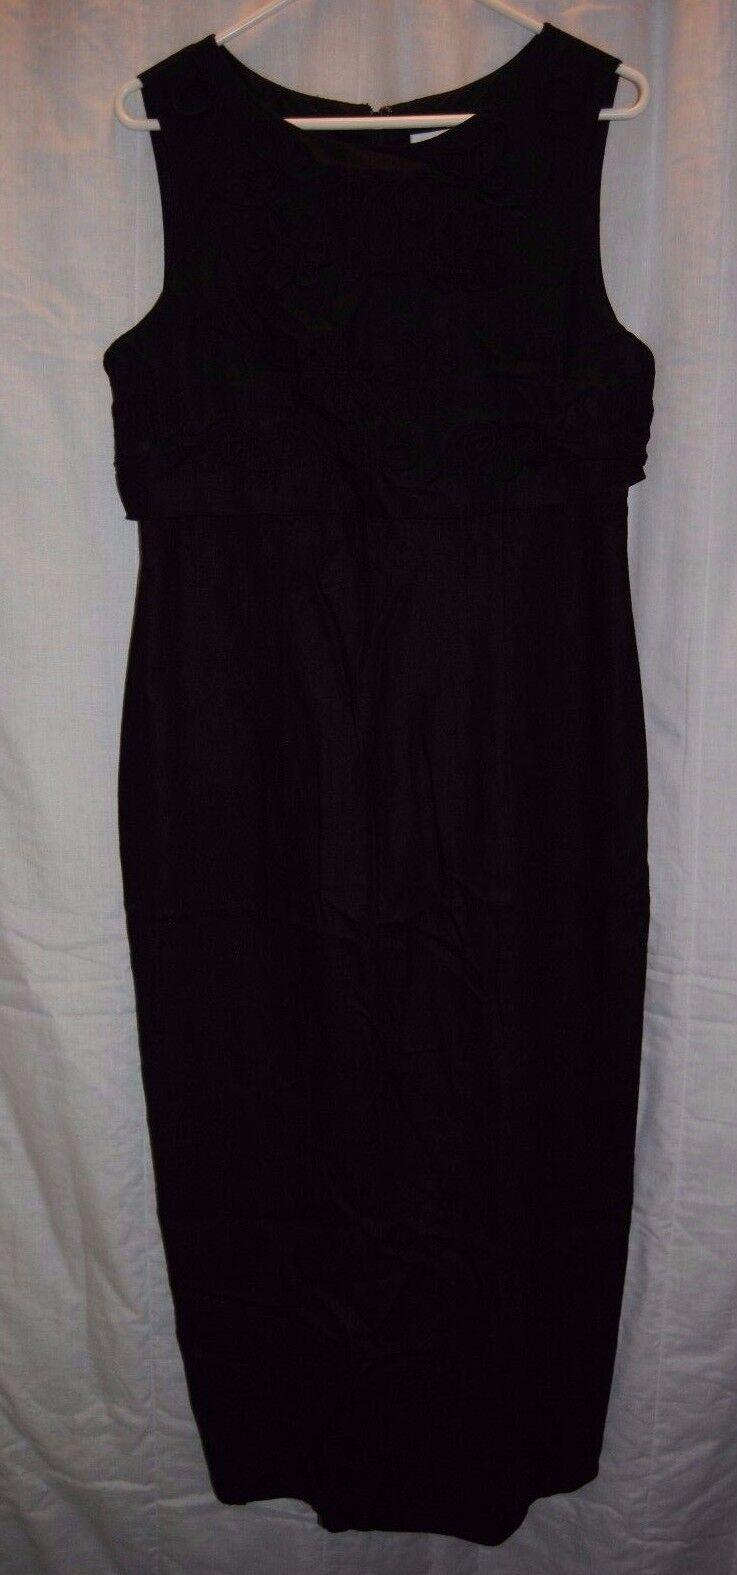 Women's JESSICA HOWARD Black Sleeveless Dress Size 10